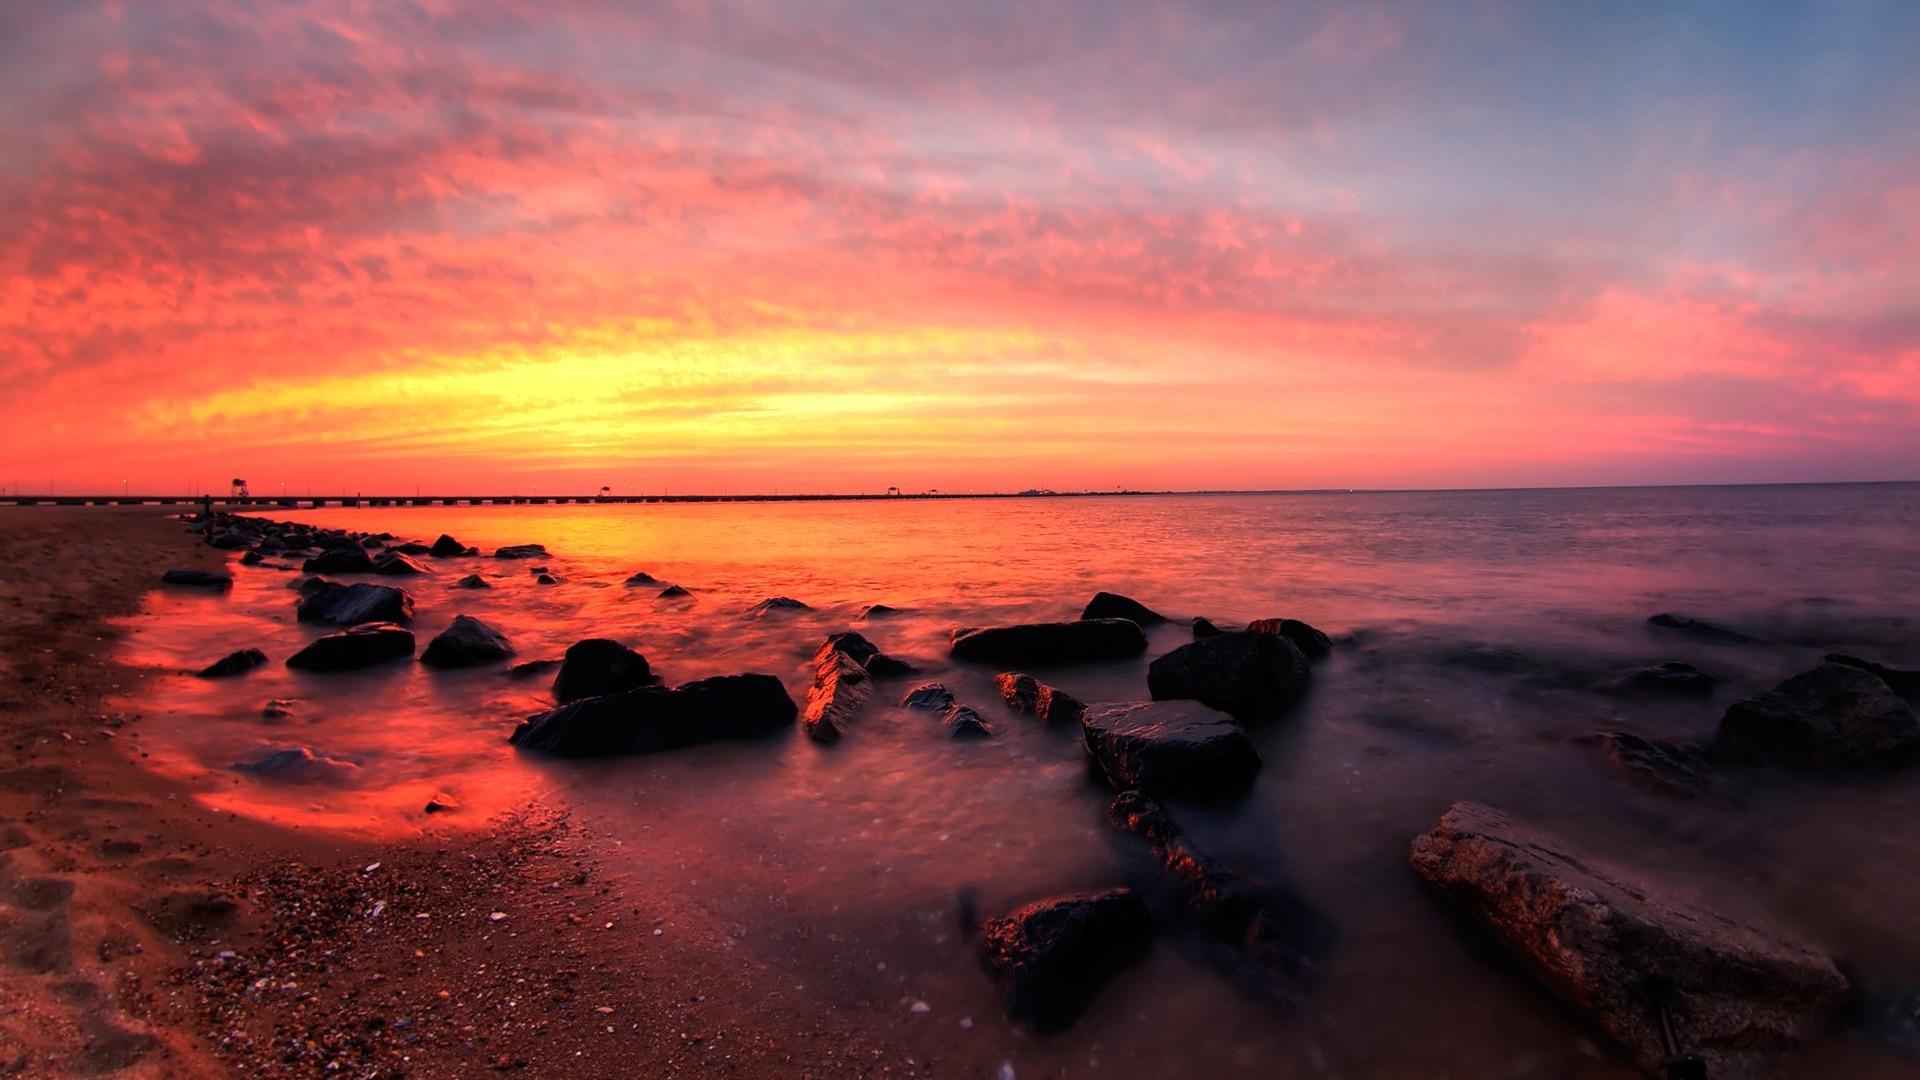 HDR sunrise and sunset landscape wallpaper 19-1920x1080 ...